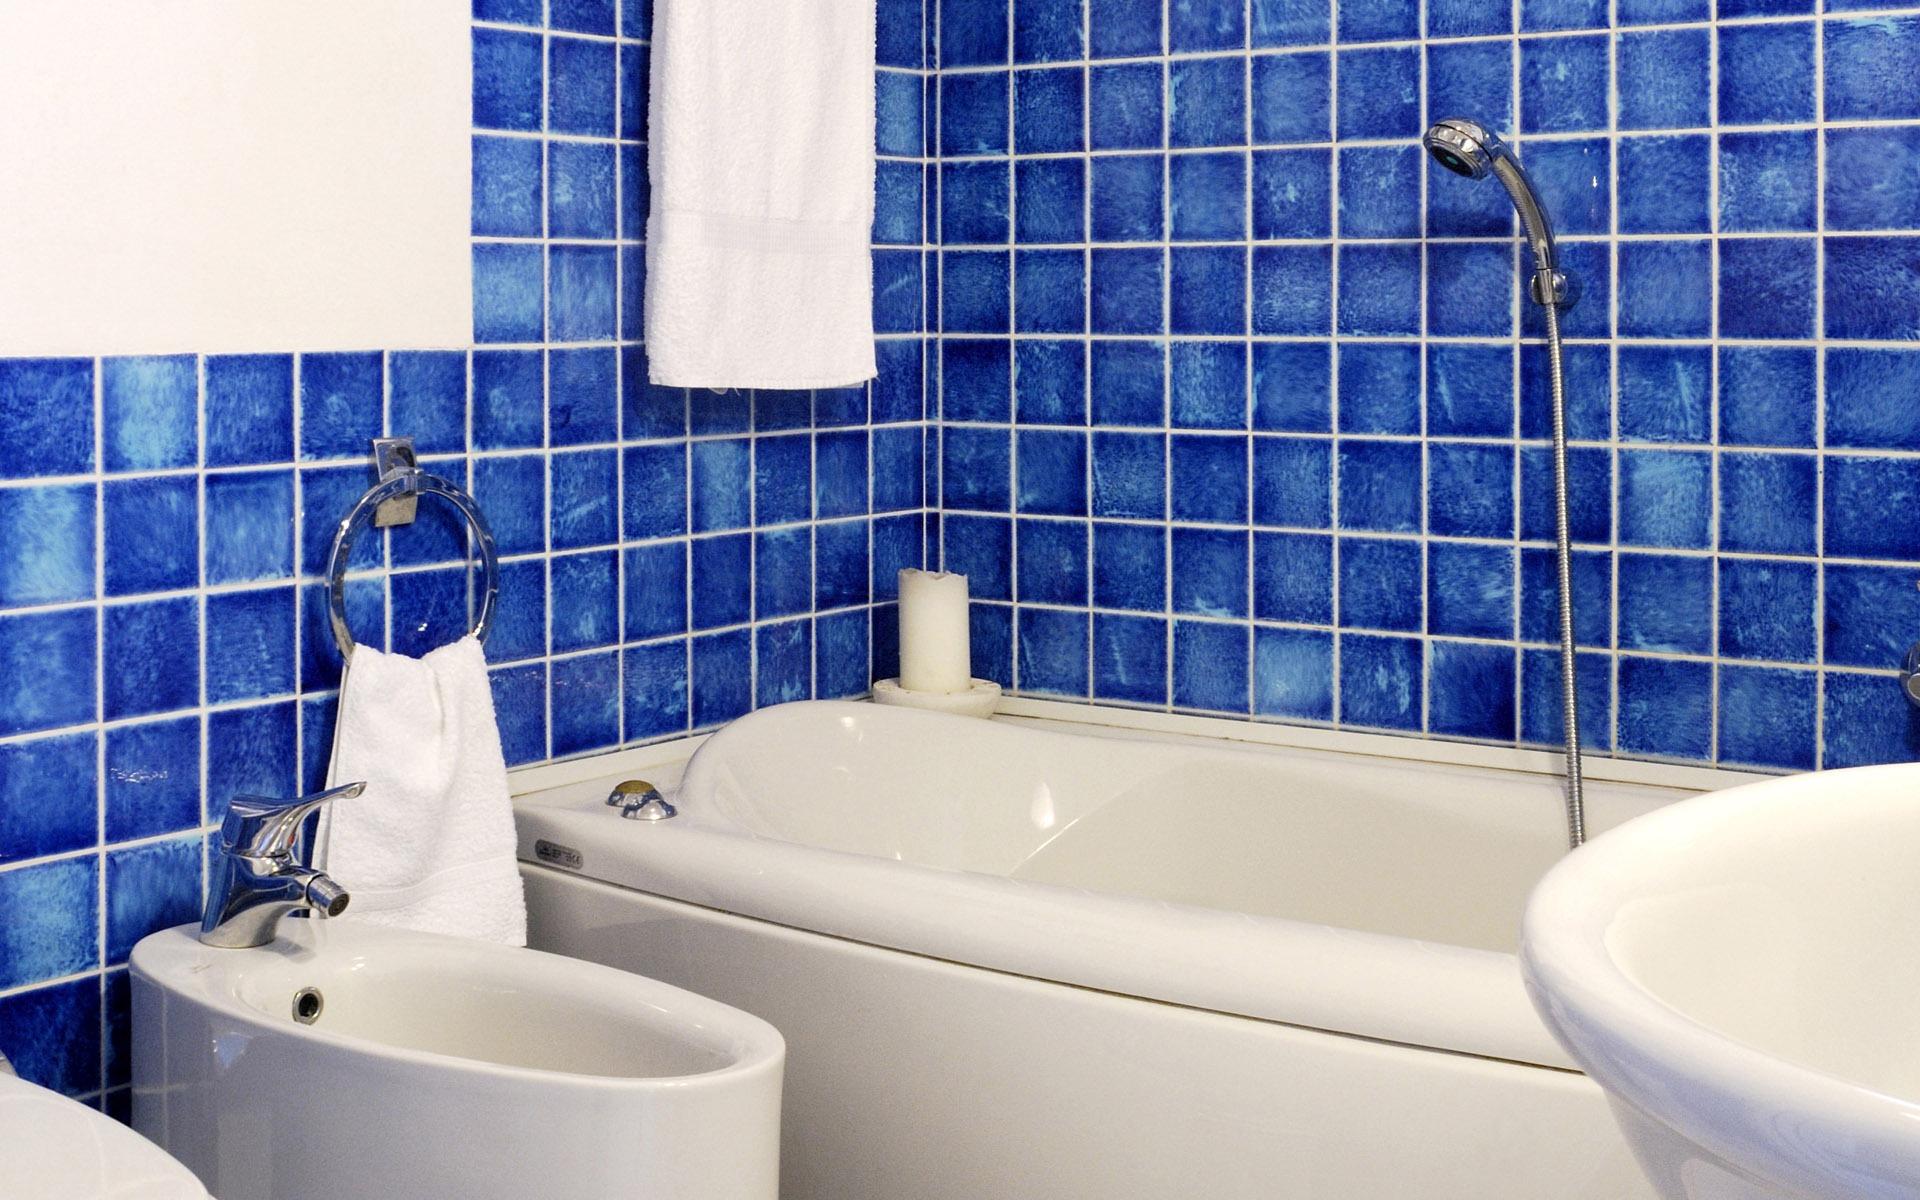 Fond d 39 cran photo salle de bain 1 6 1920x1200 fond d for Ecran salle de bain